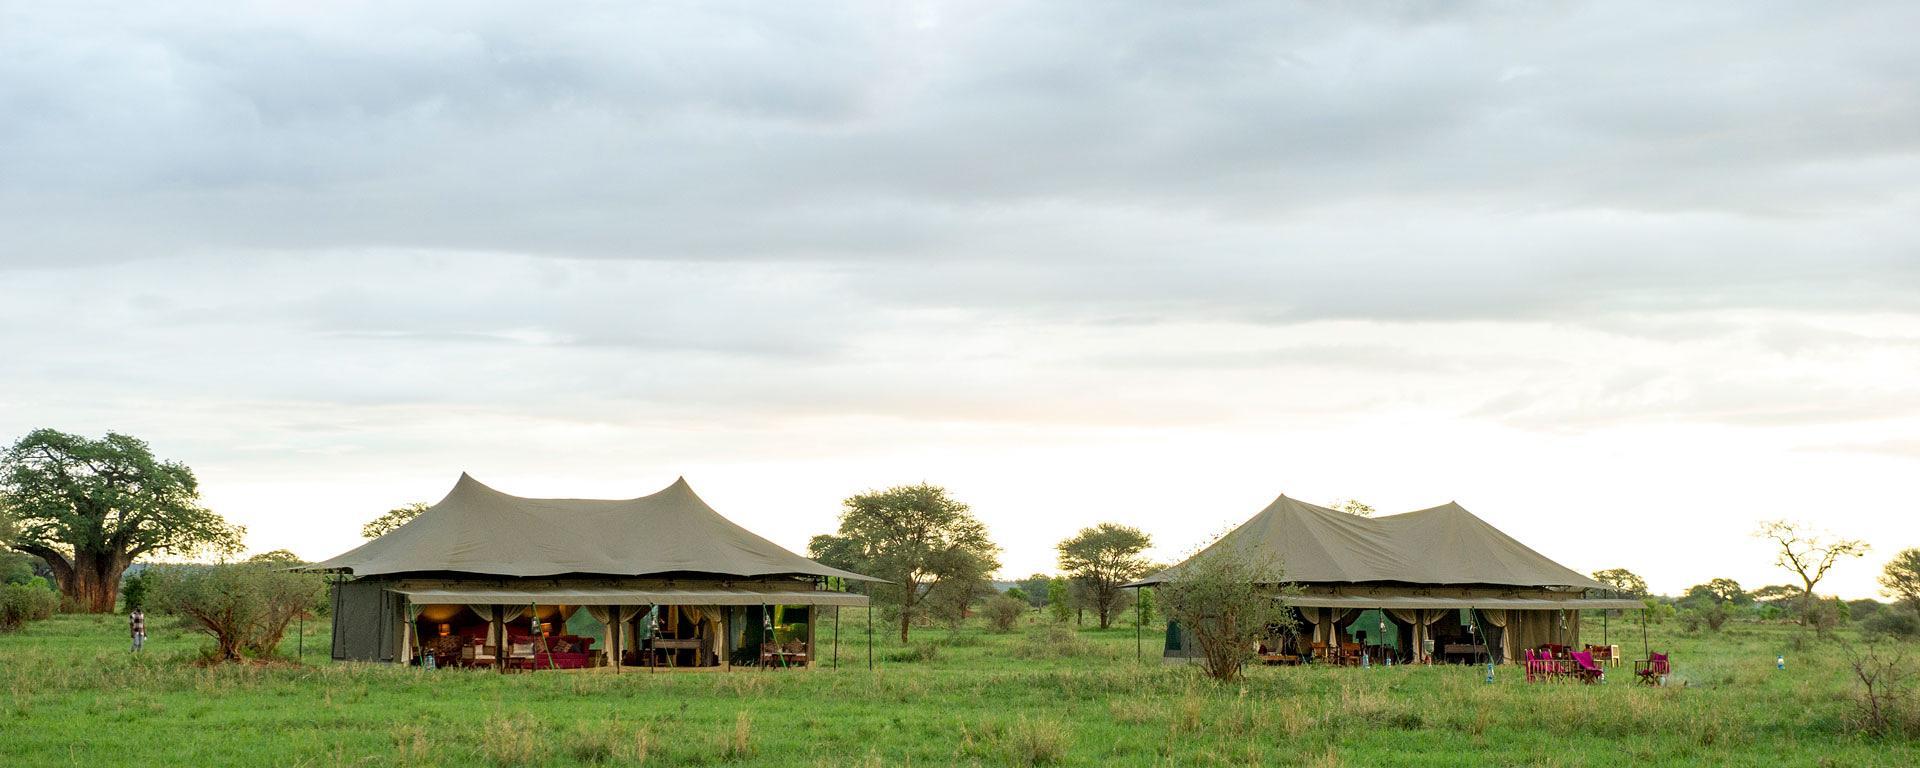 africa safari.jpg